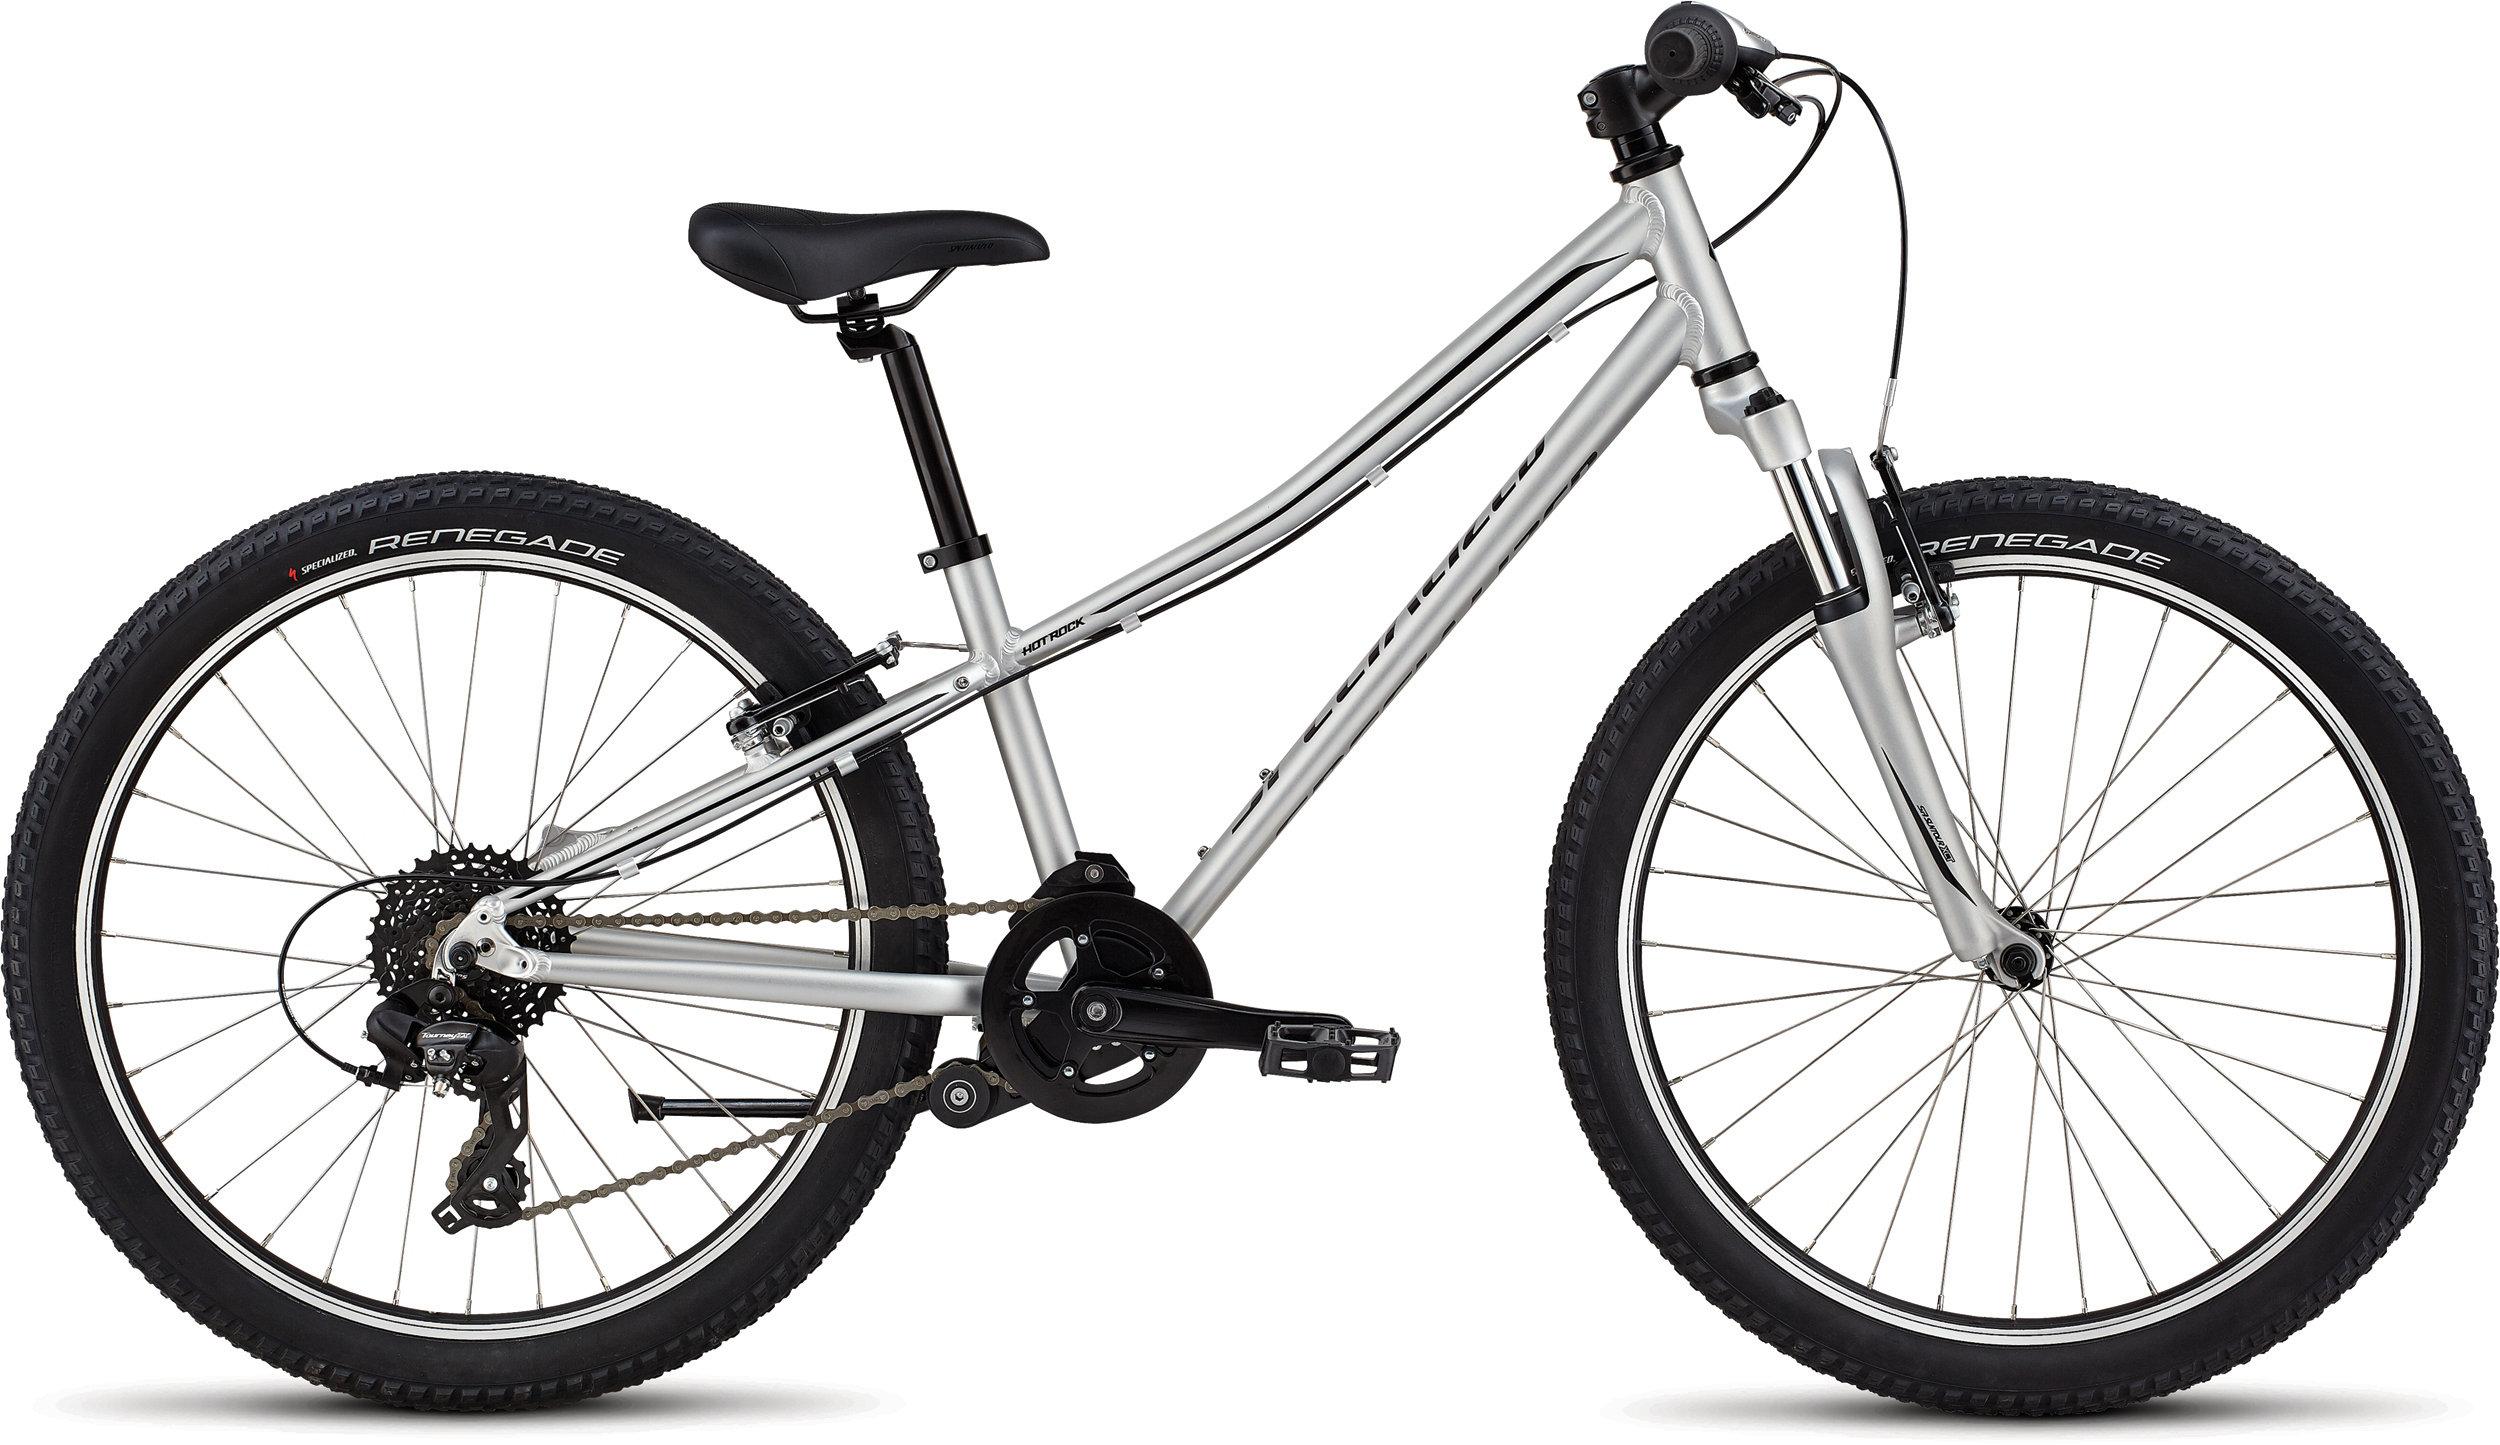 Specialized Hotrock 24 Light Silver/Black 11 - Alpha Bikes